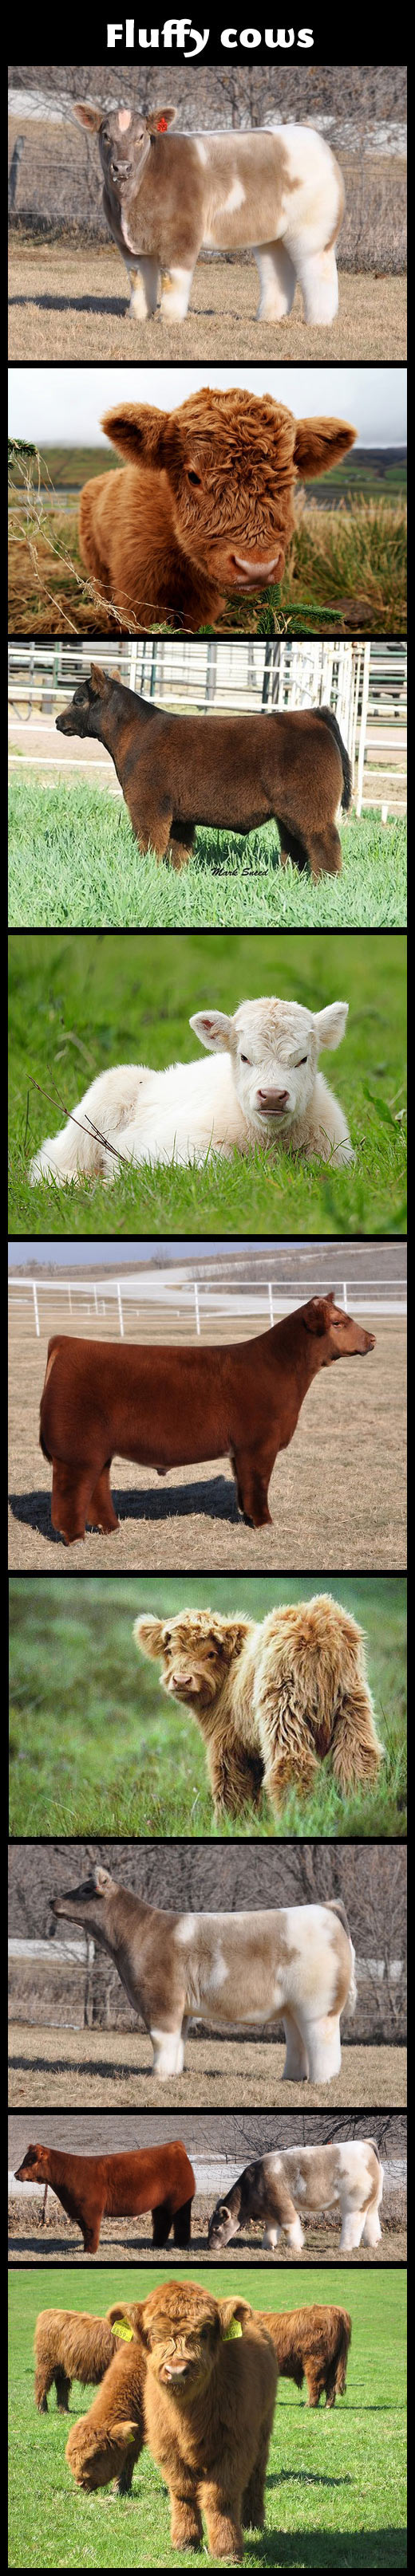 Fluffy Cows…